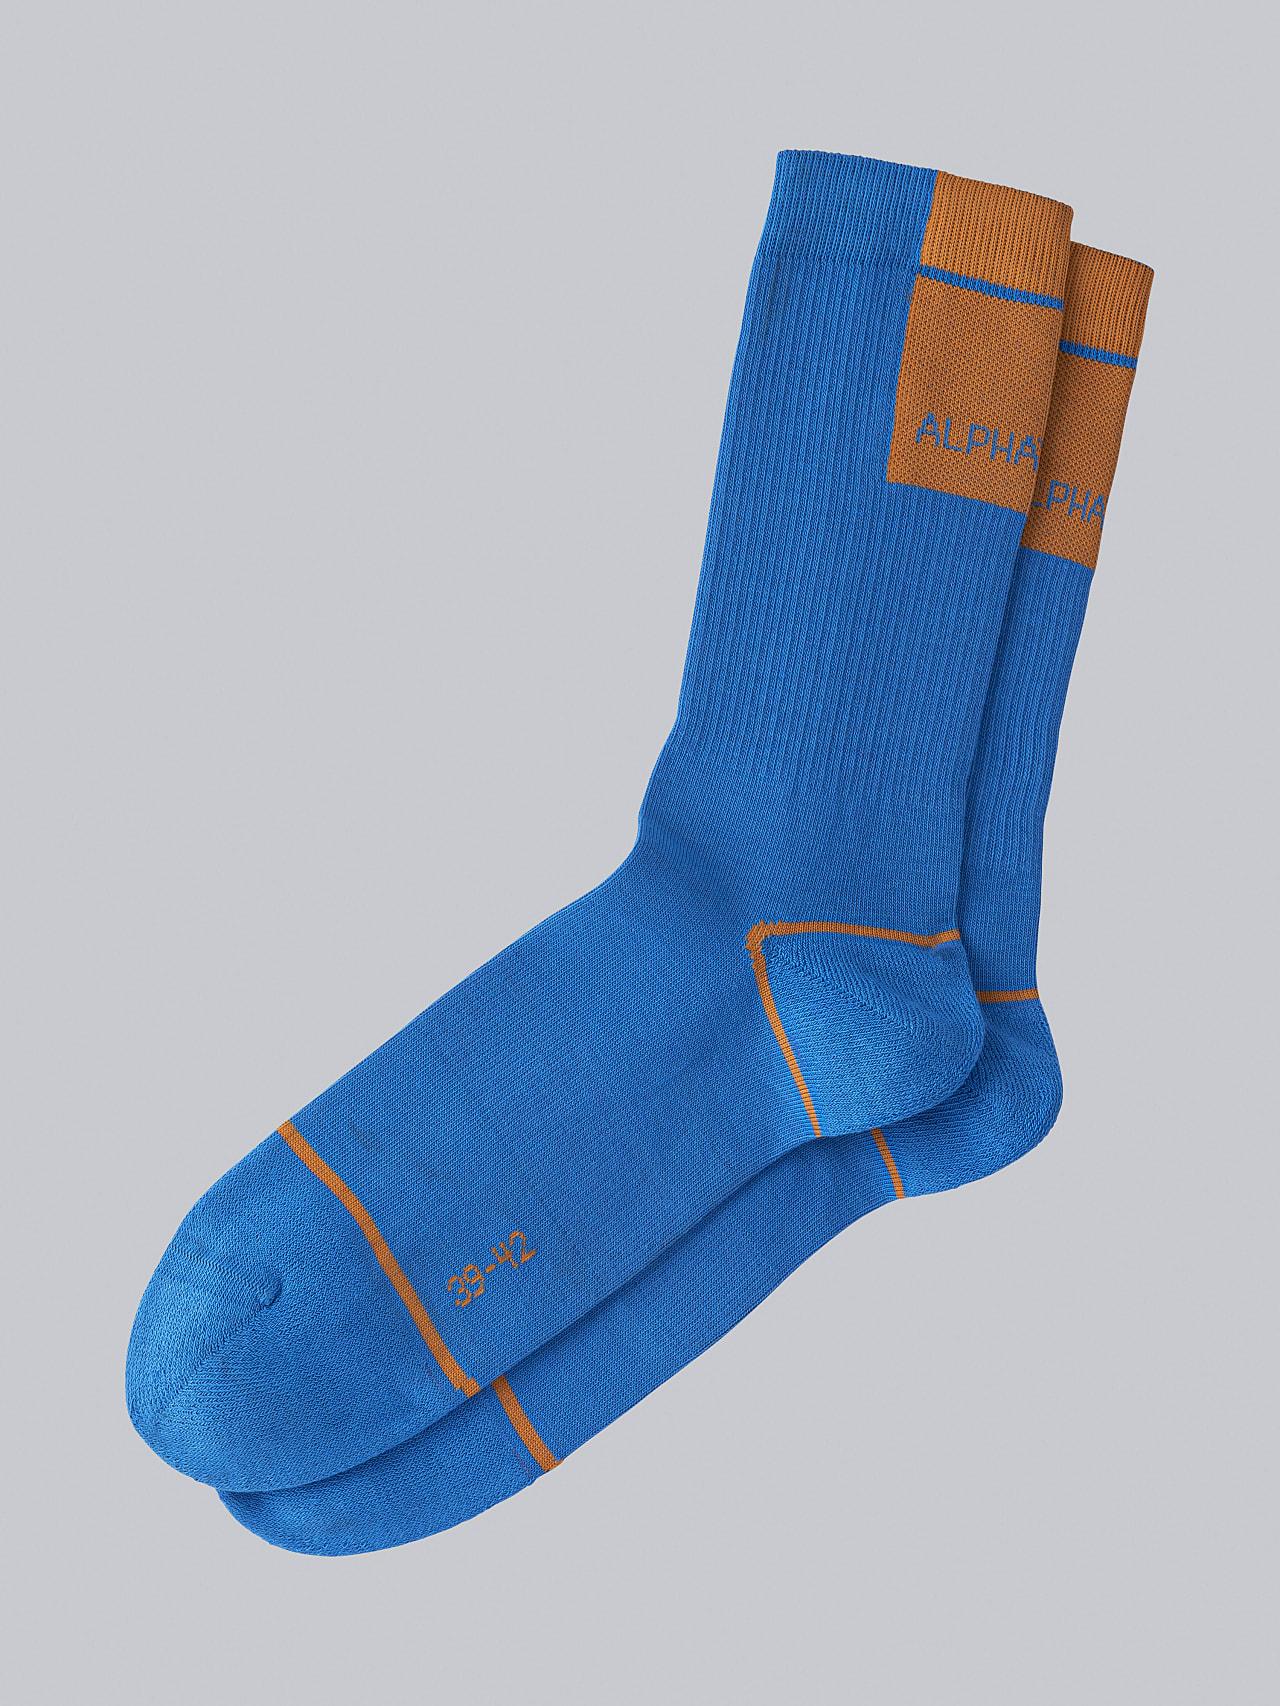 ATENI V3.Y5.02 Premium Knit Socks blue Back Alpha Tauri